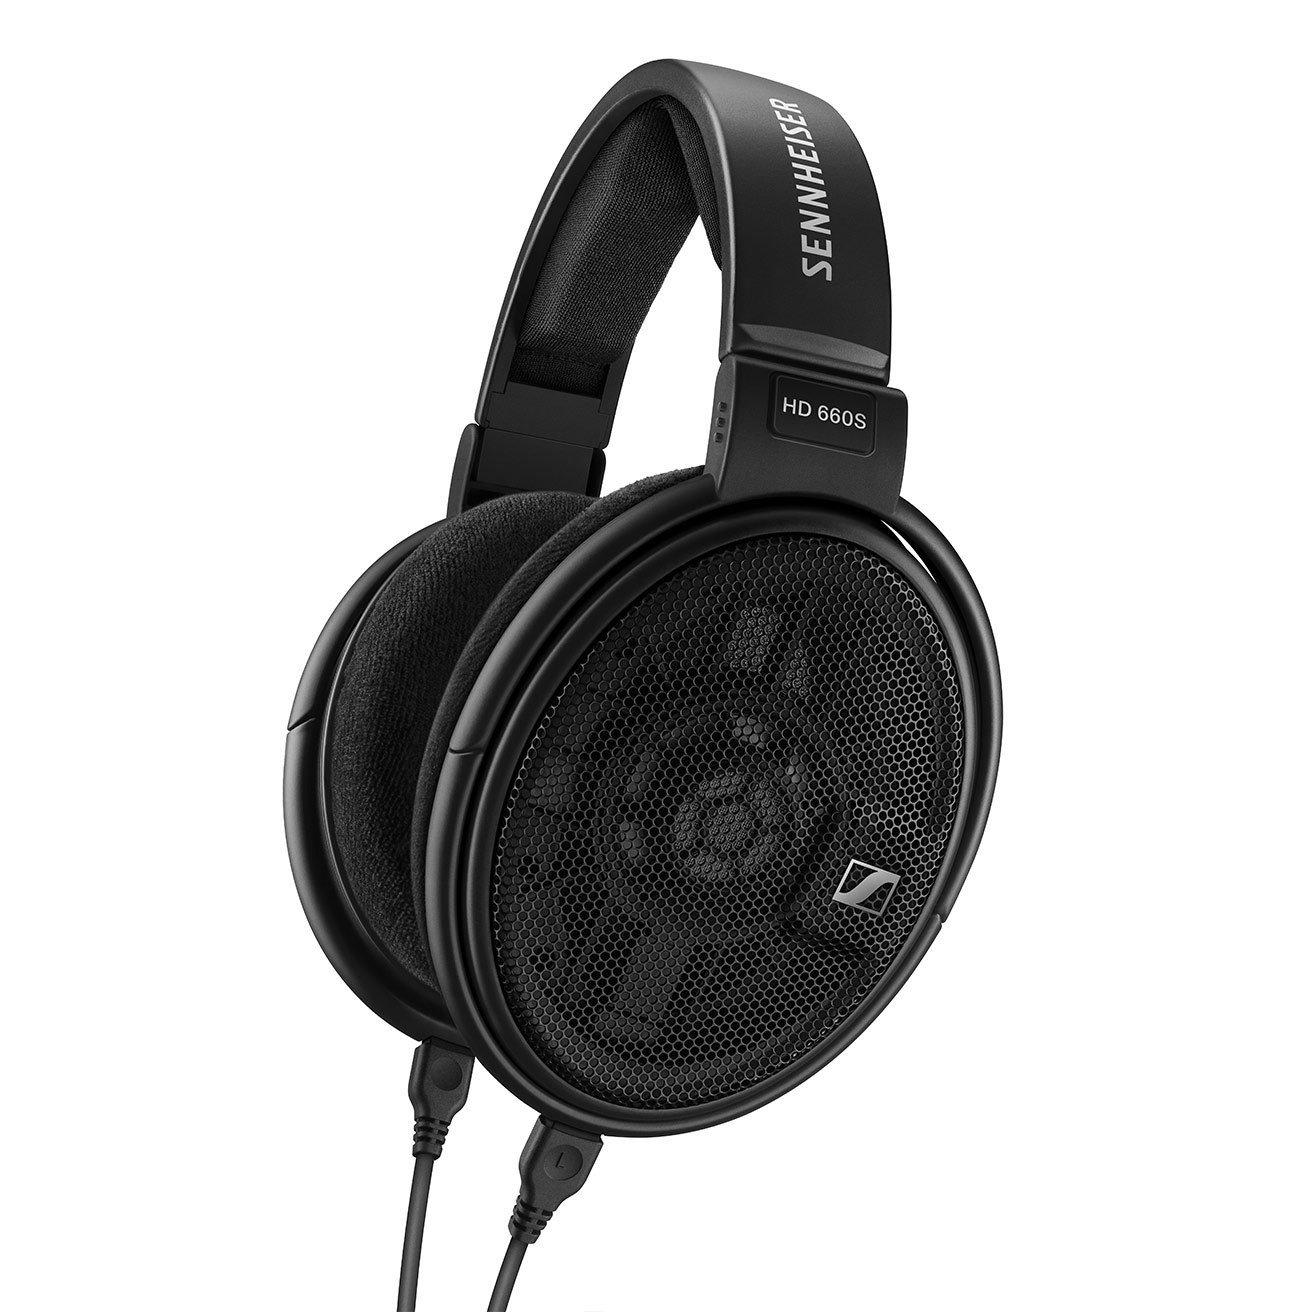 Casque audio filaire HiFi Sennheiser HD 660S - Noir (Reconditionné)